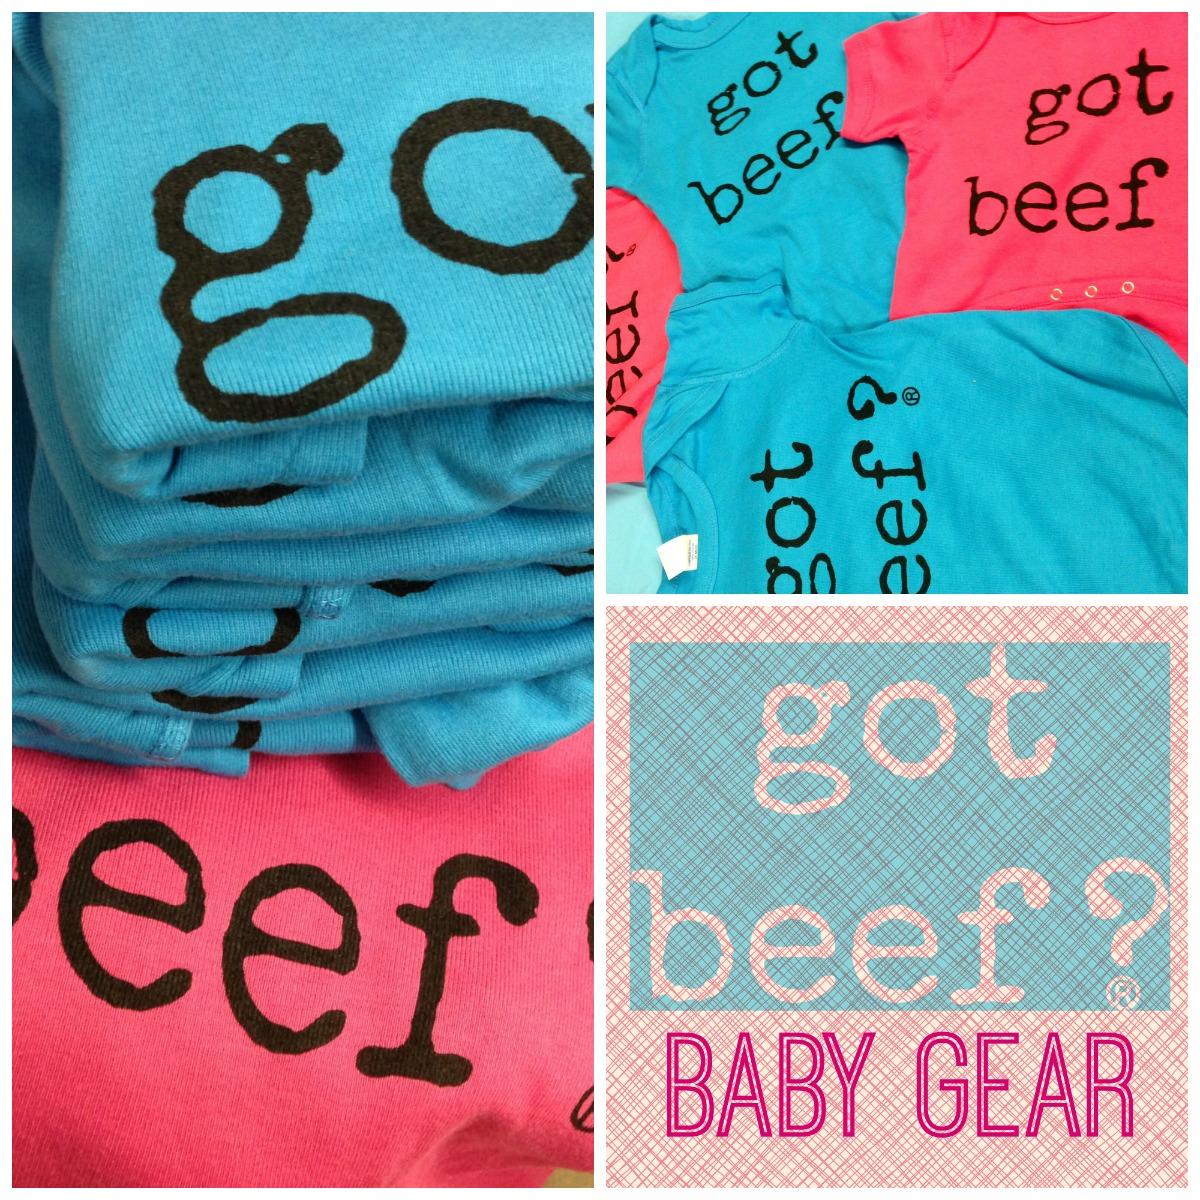 Got Beef Baby Gear